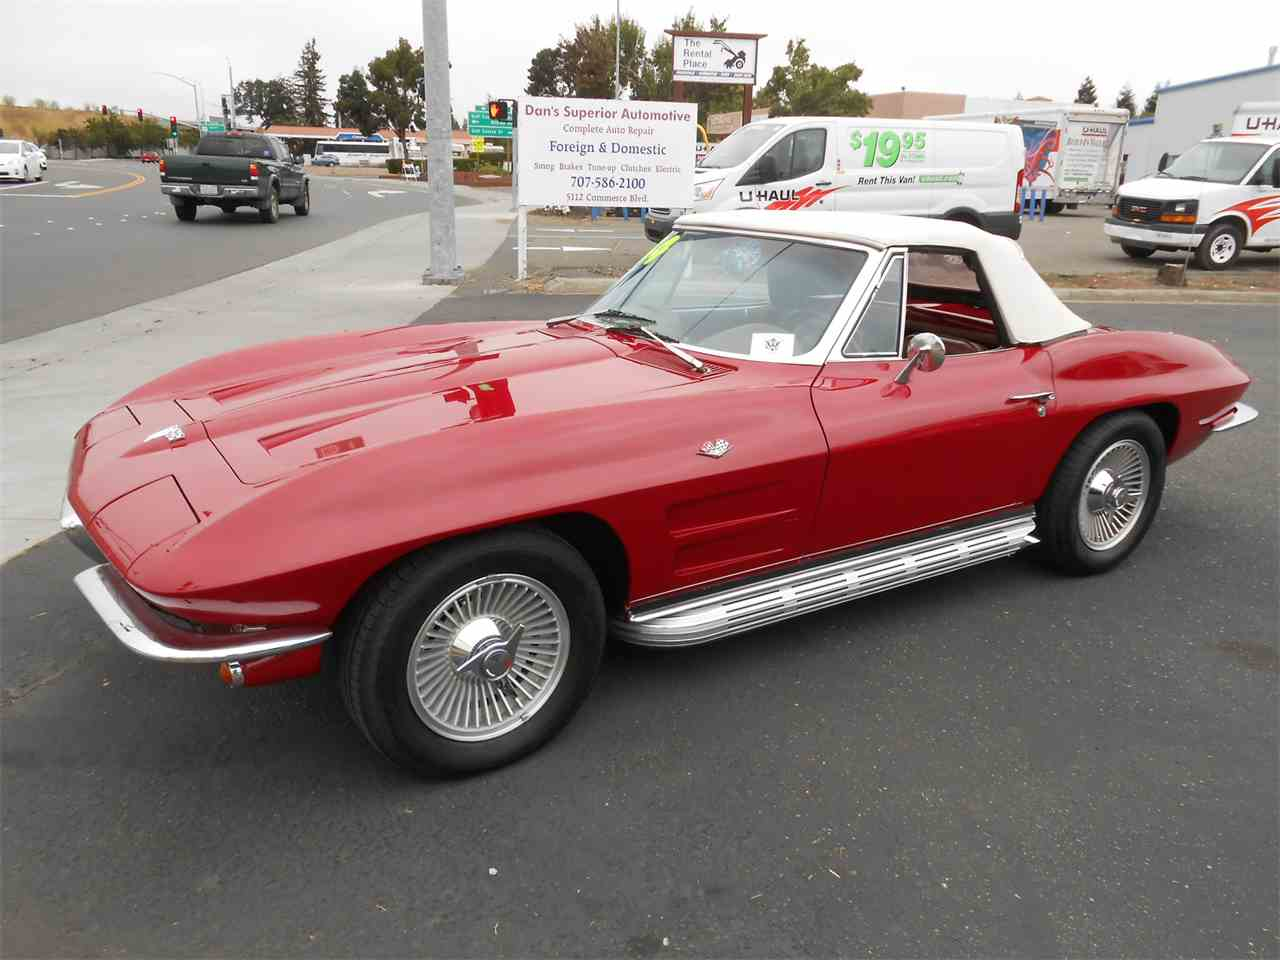 Corvette 1964 chevrolet corvette : 1964 Chevrolet Corvette for Sale | ClassicCars.com | CC-931355